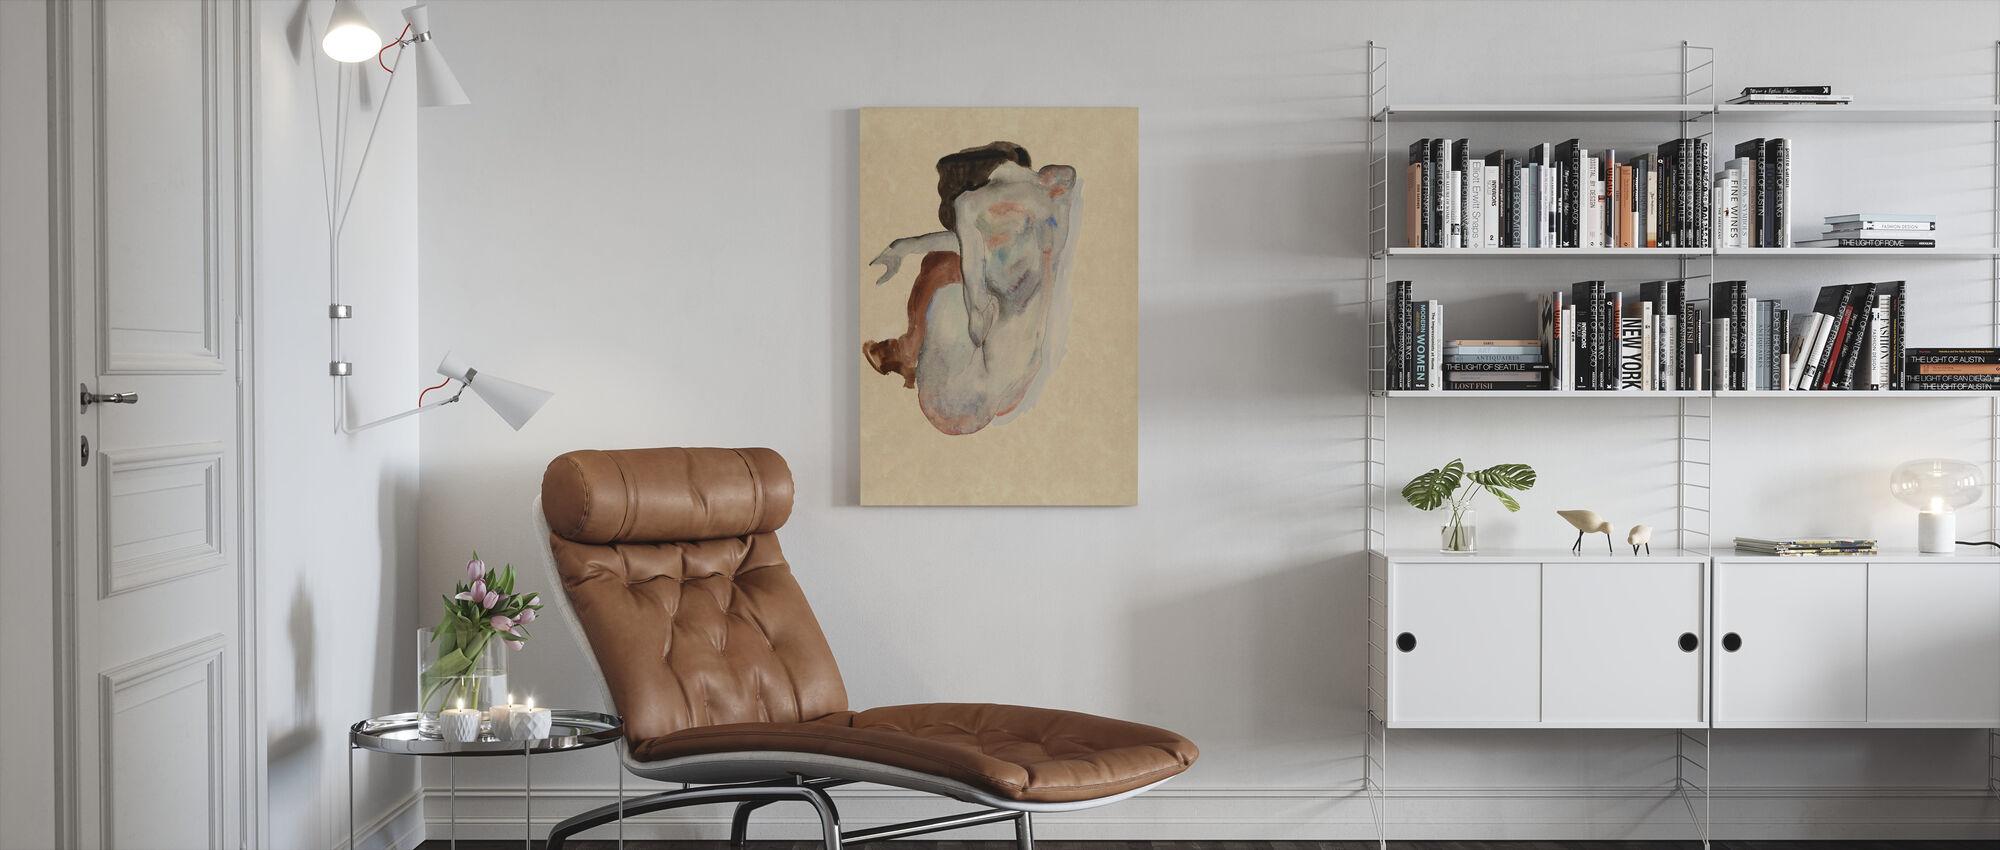 Kroker Naken - Egon Schiele - Lerretsbilde - Stue